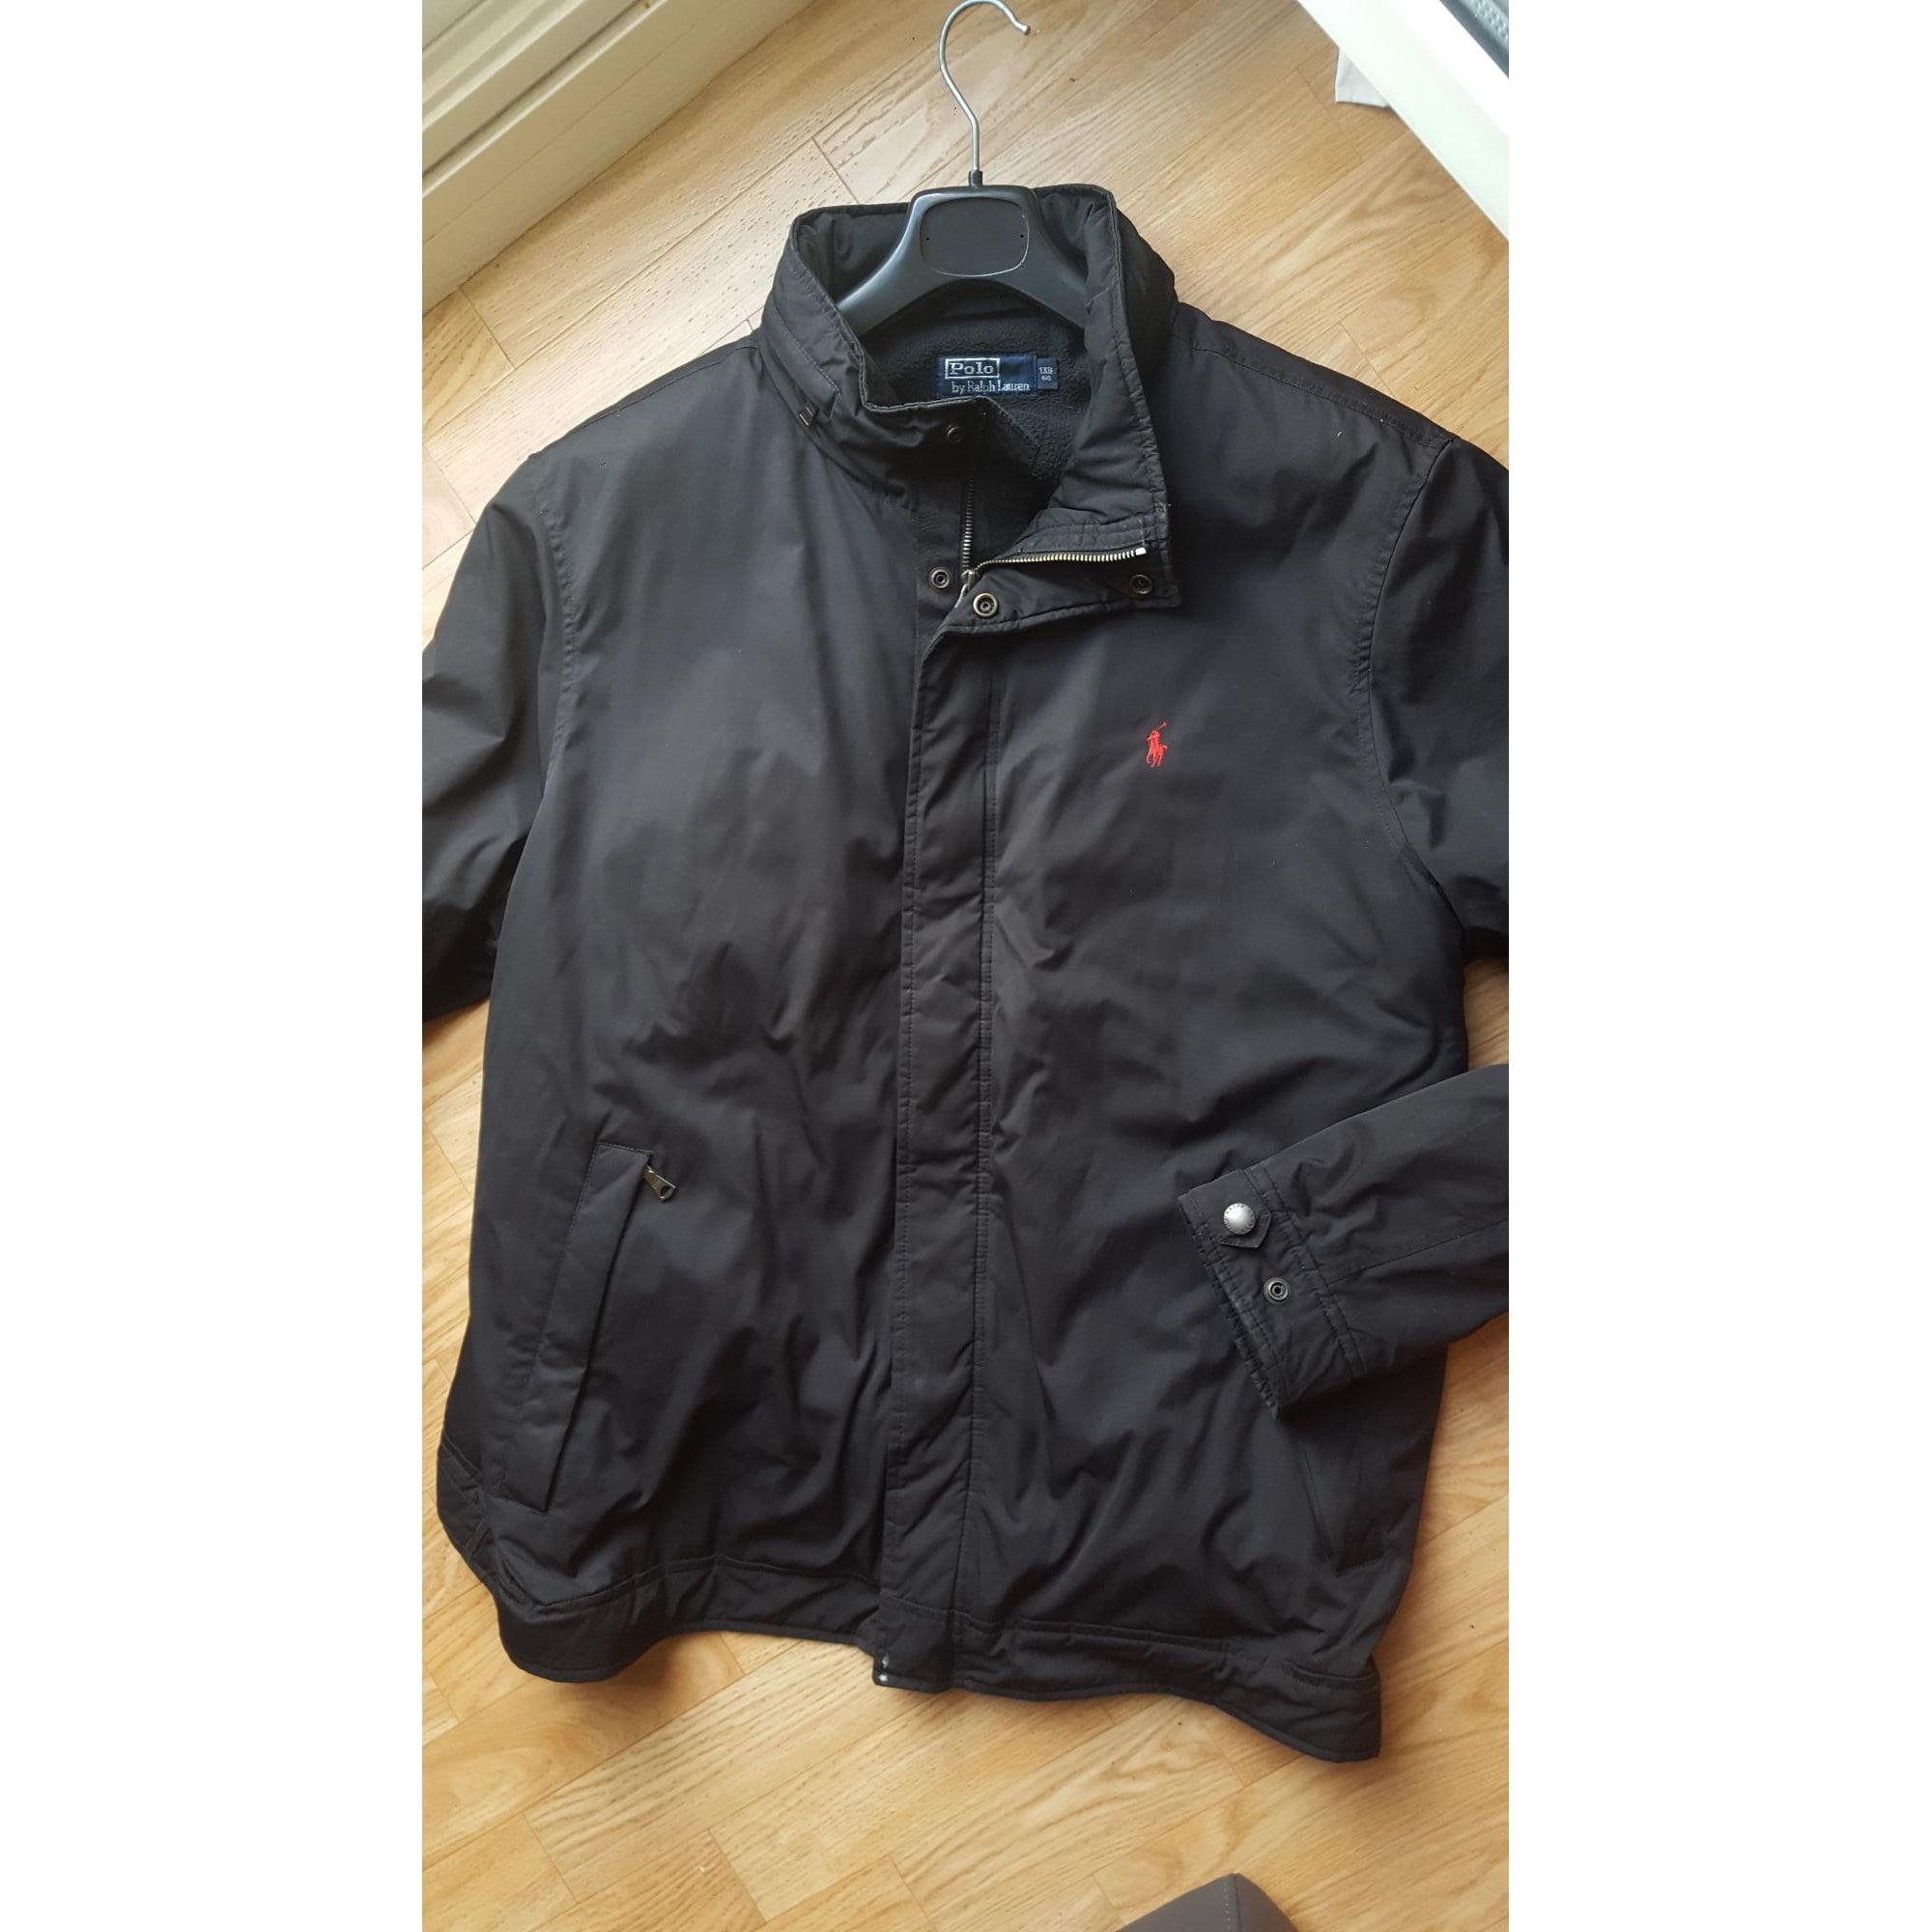 4837ab7bf47 Manteau RALPH LAUREN 58 (XL) noir - 7807285